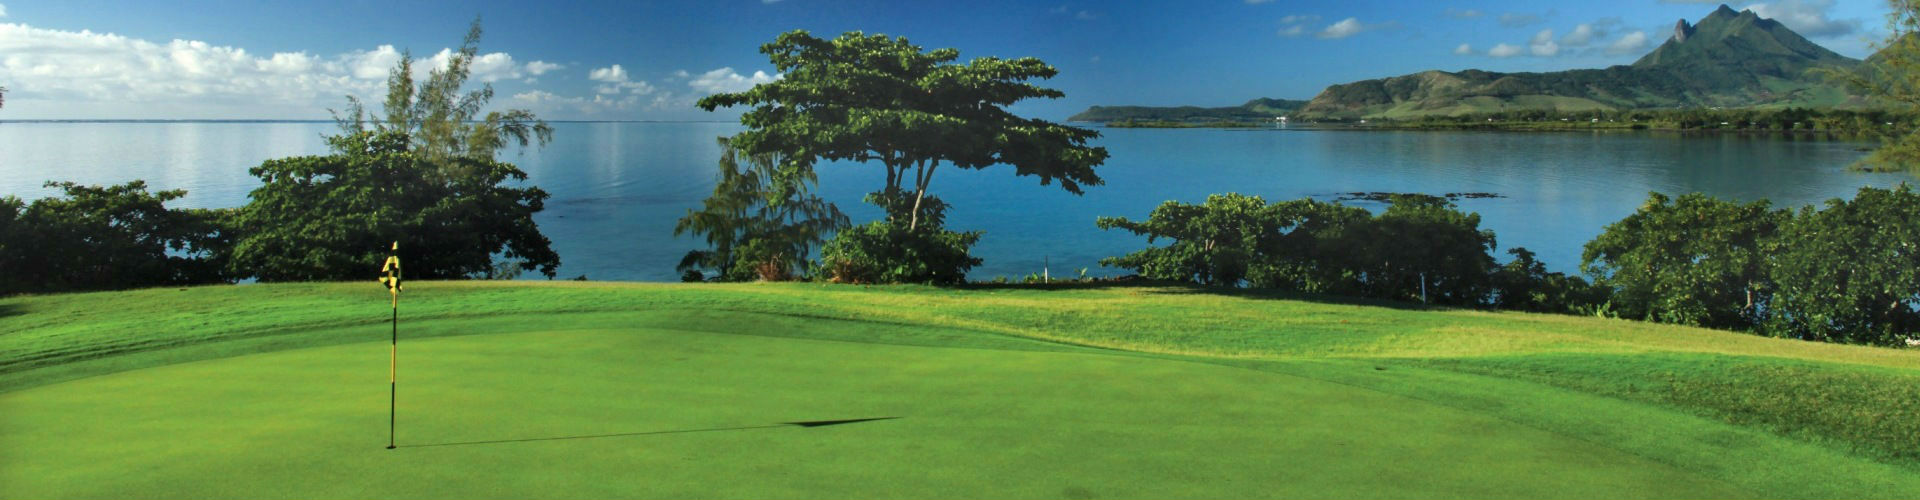 Golfresor Mauritius - golfreseguiden.se